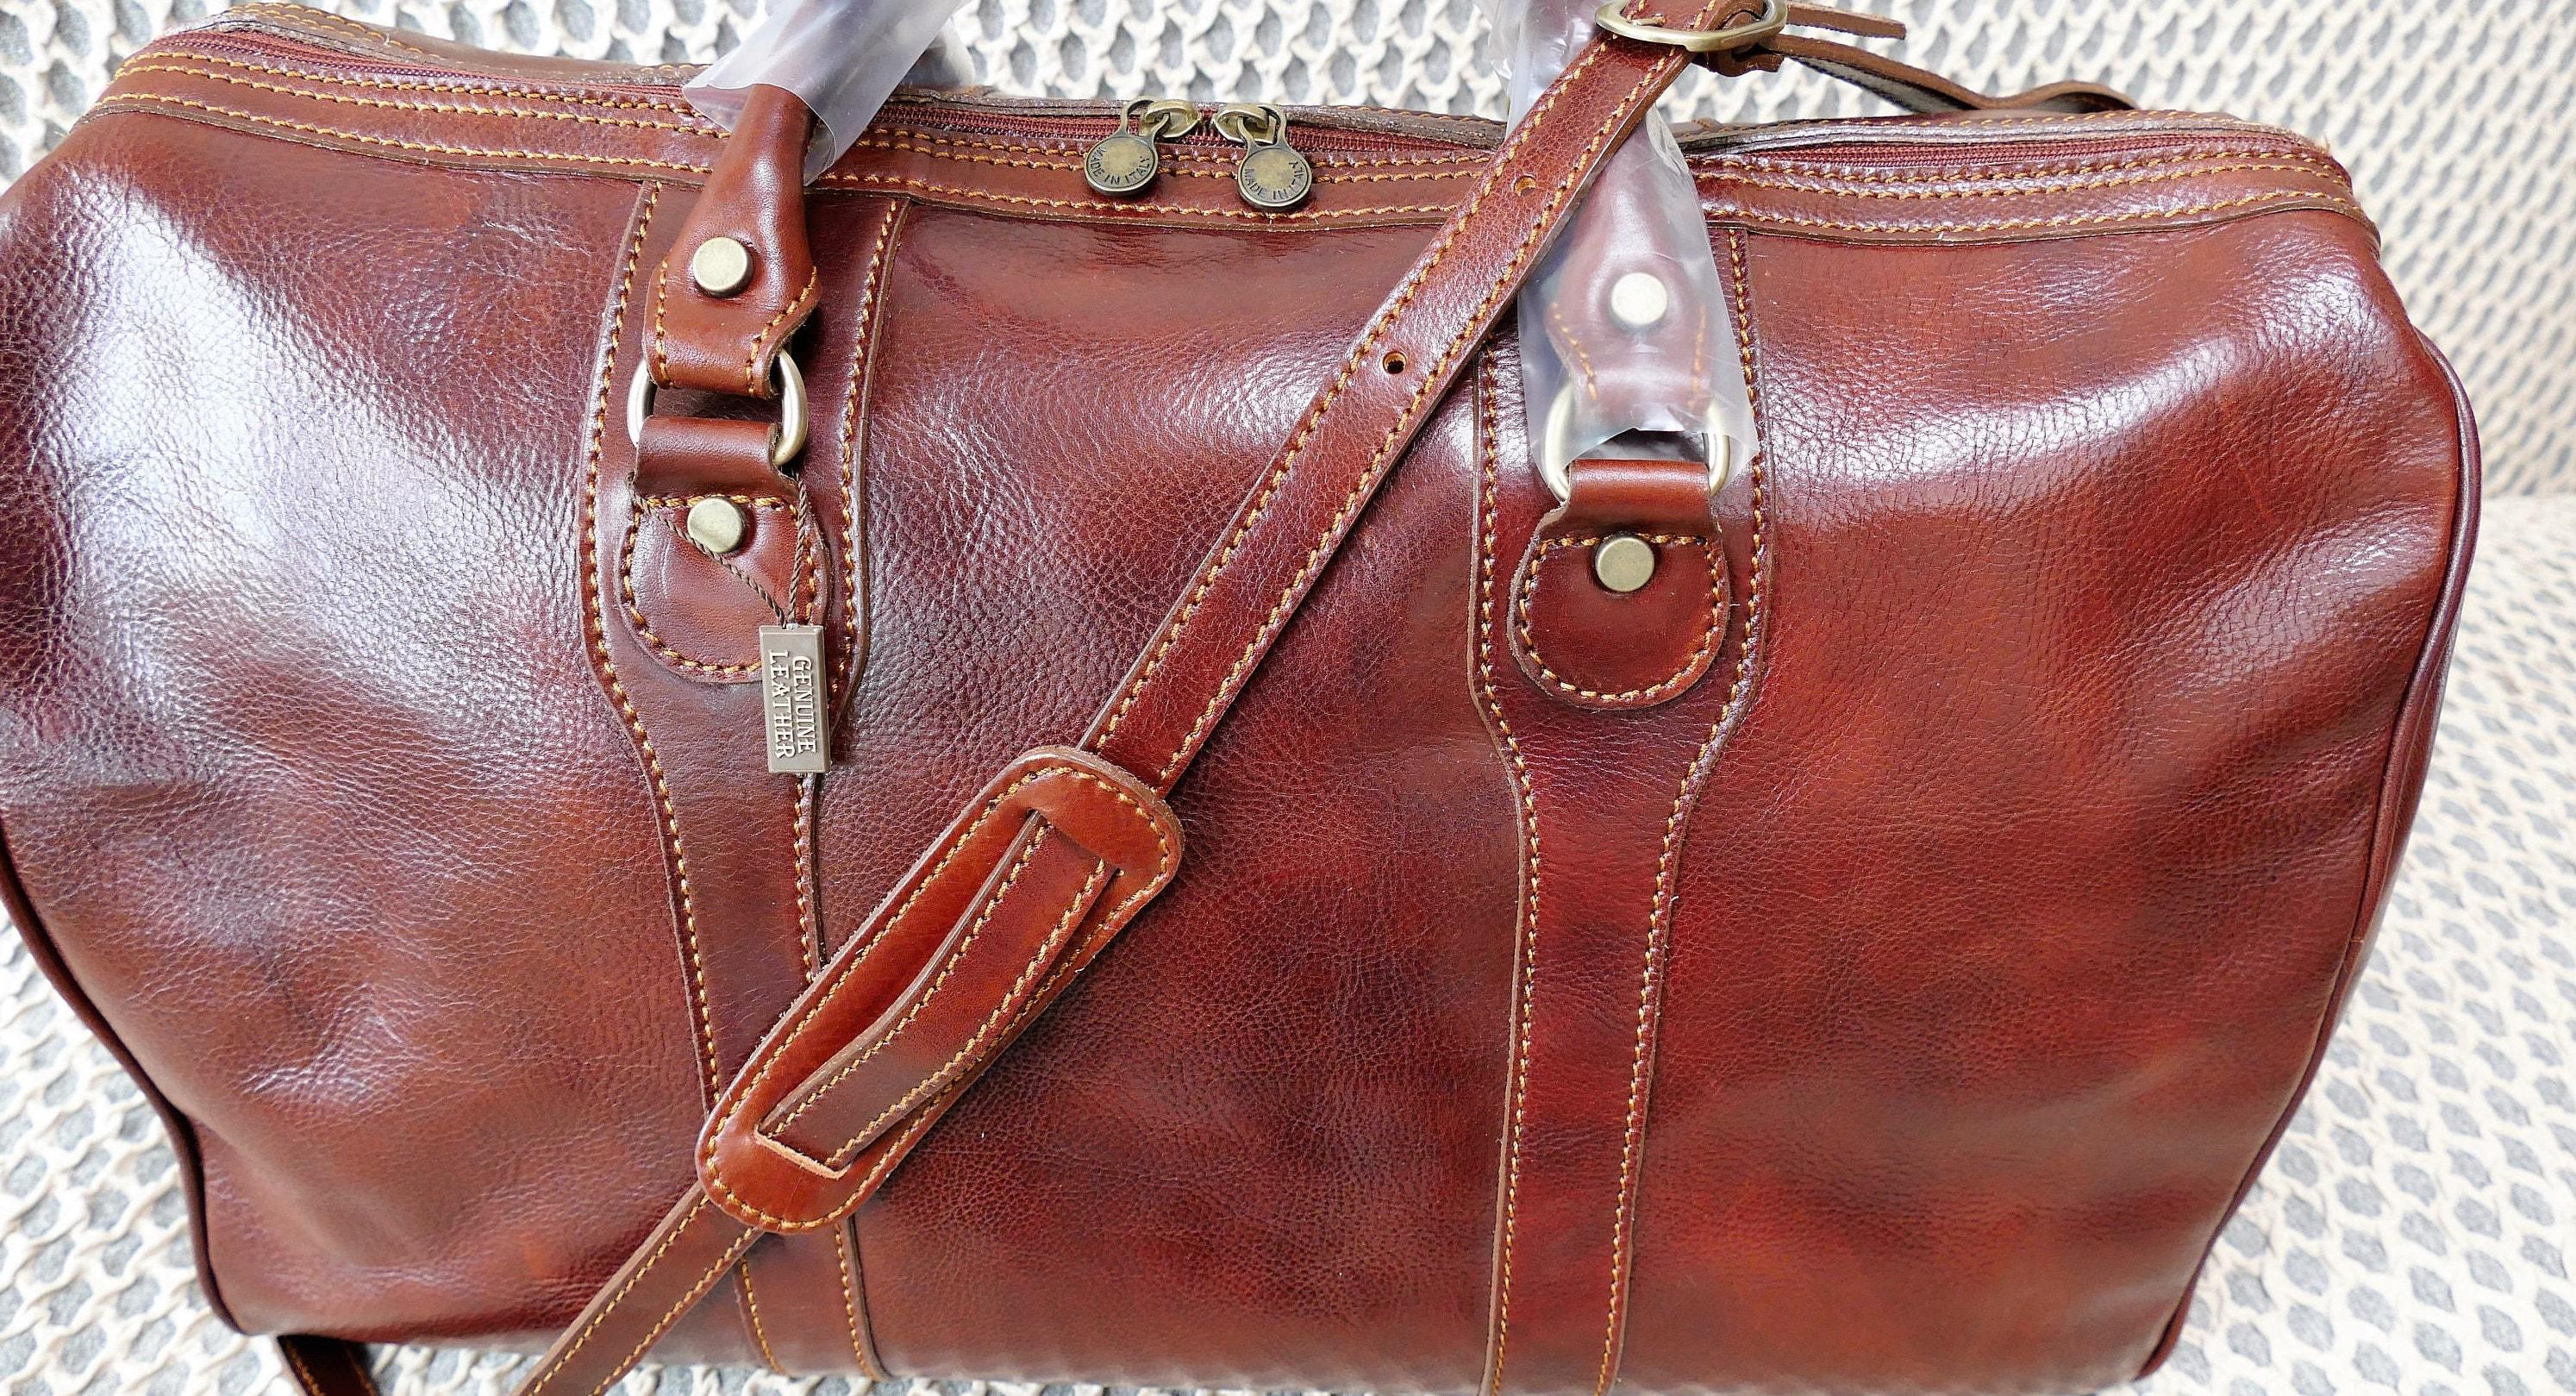 Genuine Leather Duffel Bag Travel Bag Weekend bag Real Leather Unisex Travel Bag Italian Leather Cabin Bag Brand New